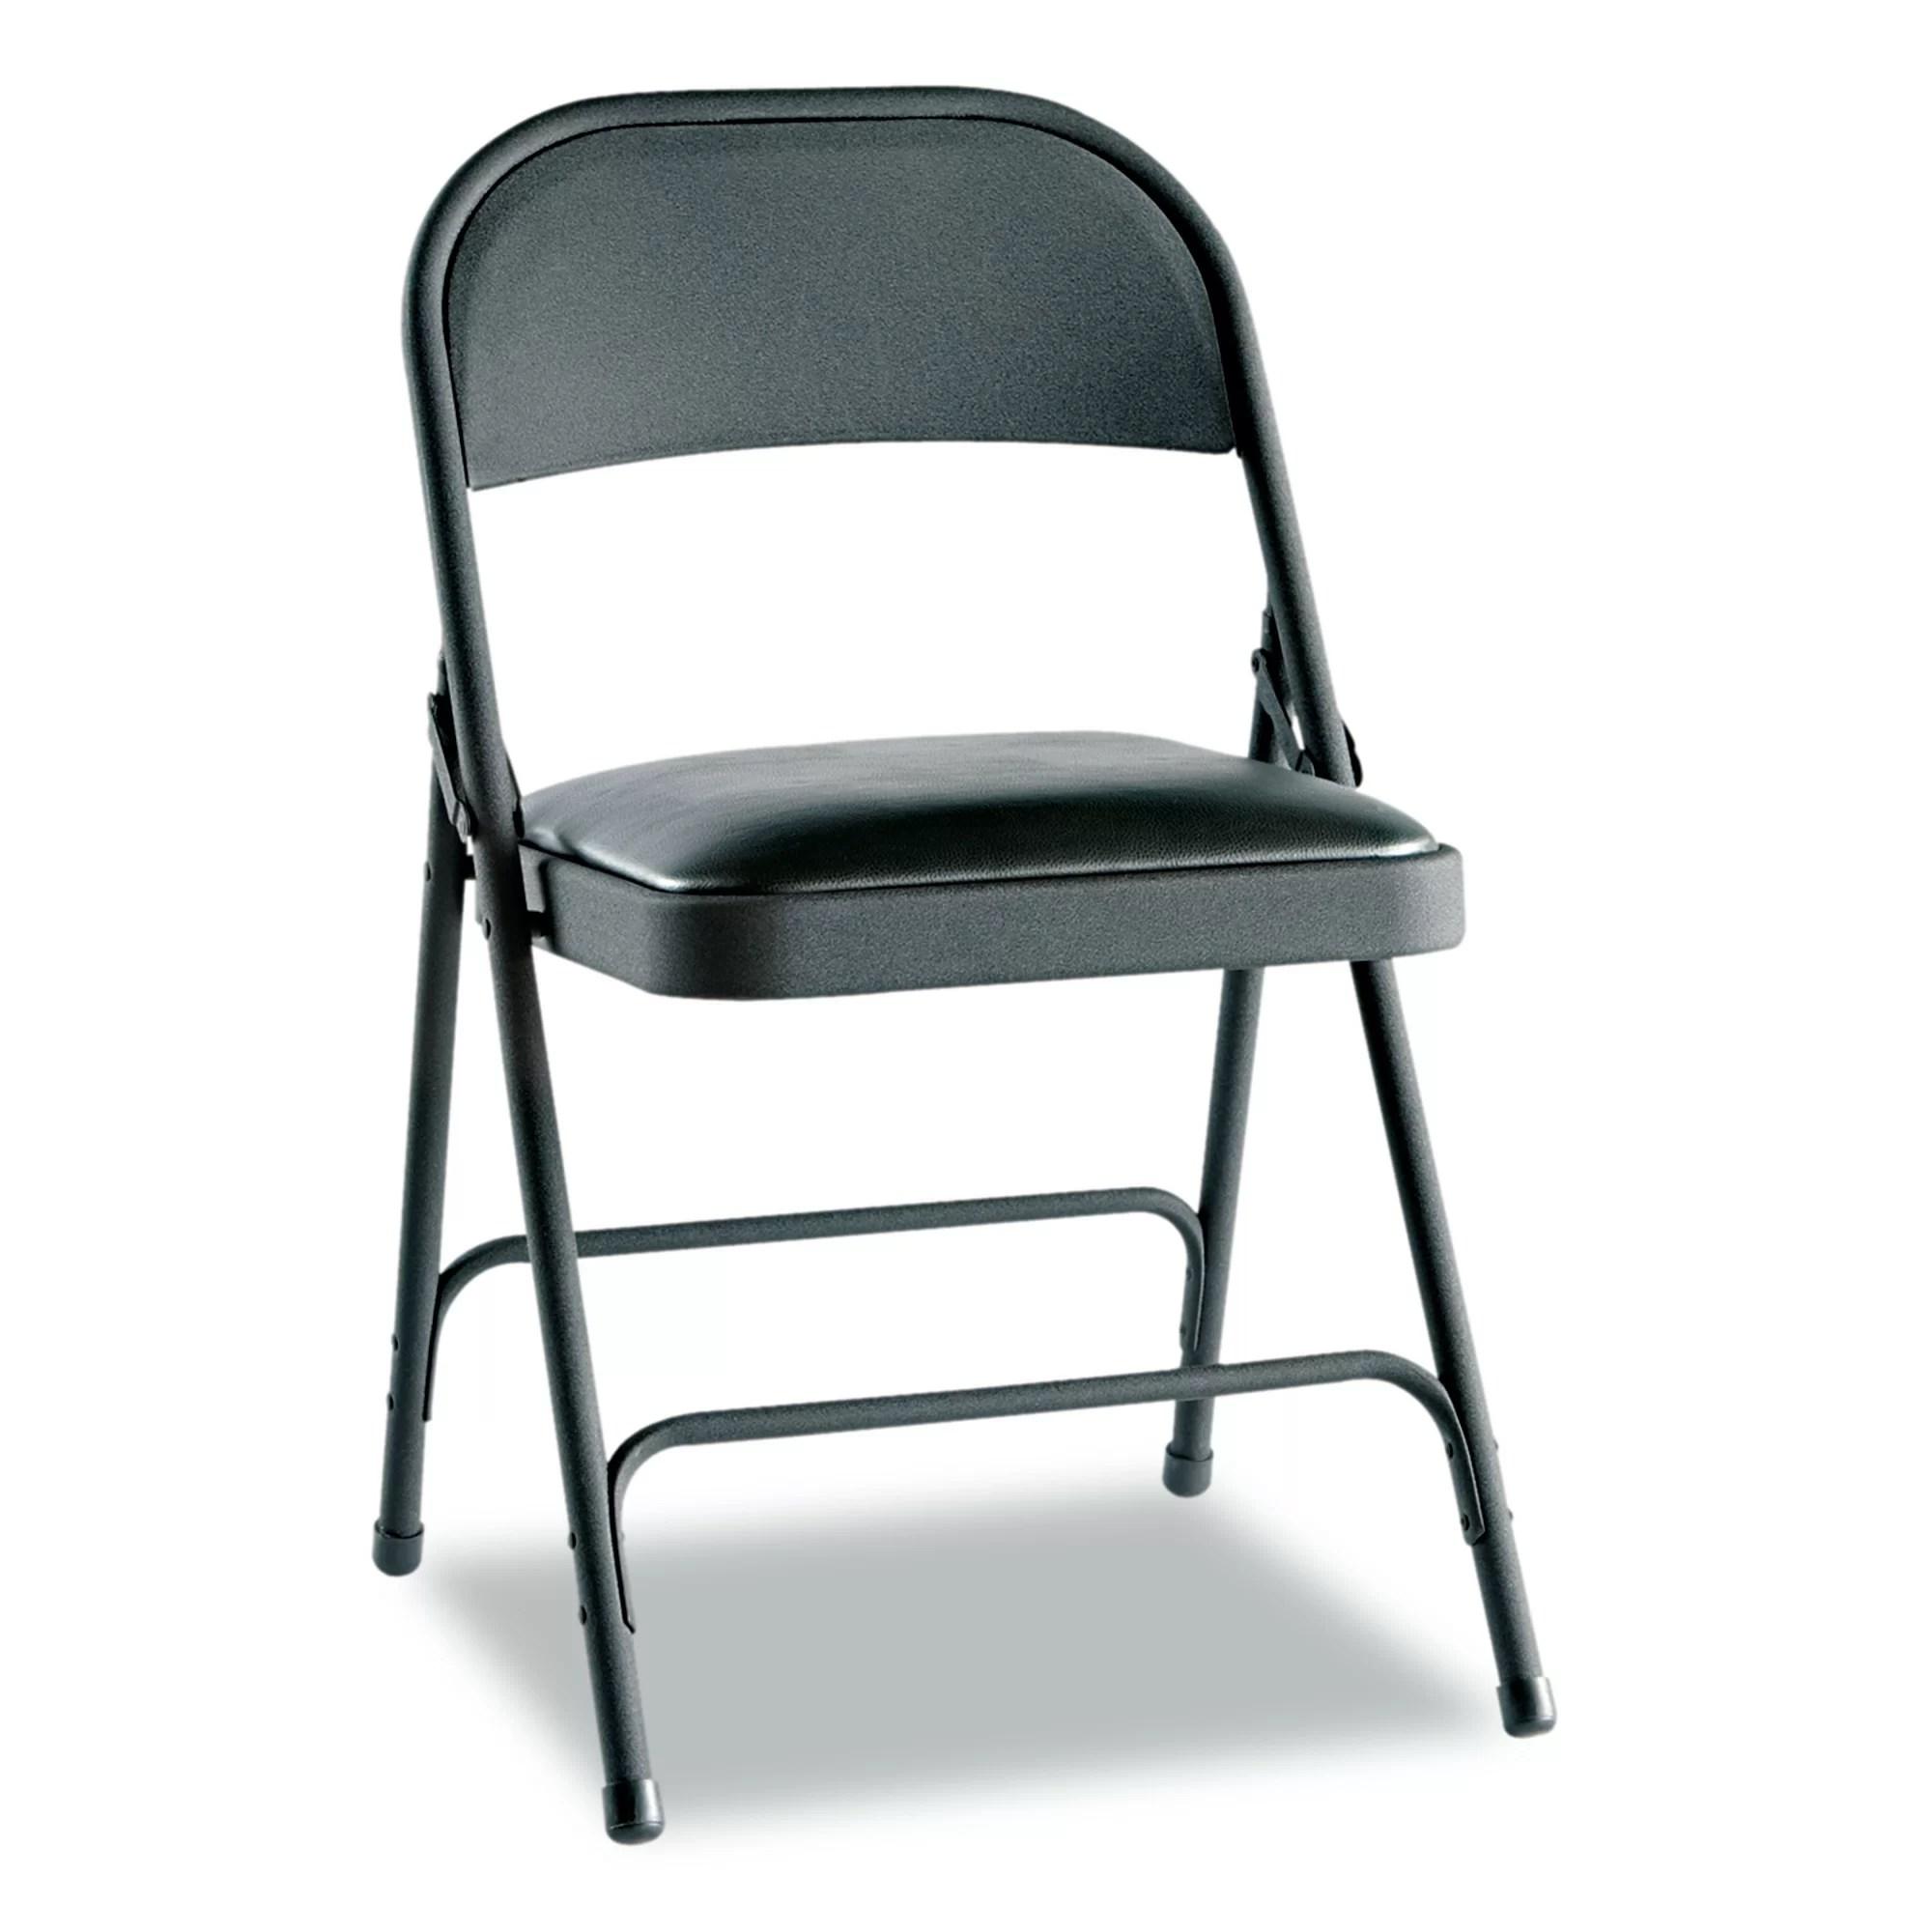 cloth padded folding chairs rocker chair alera fabric reviews wayfair